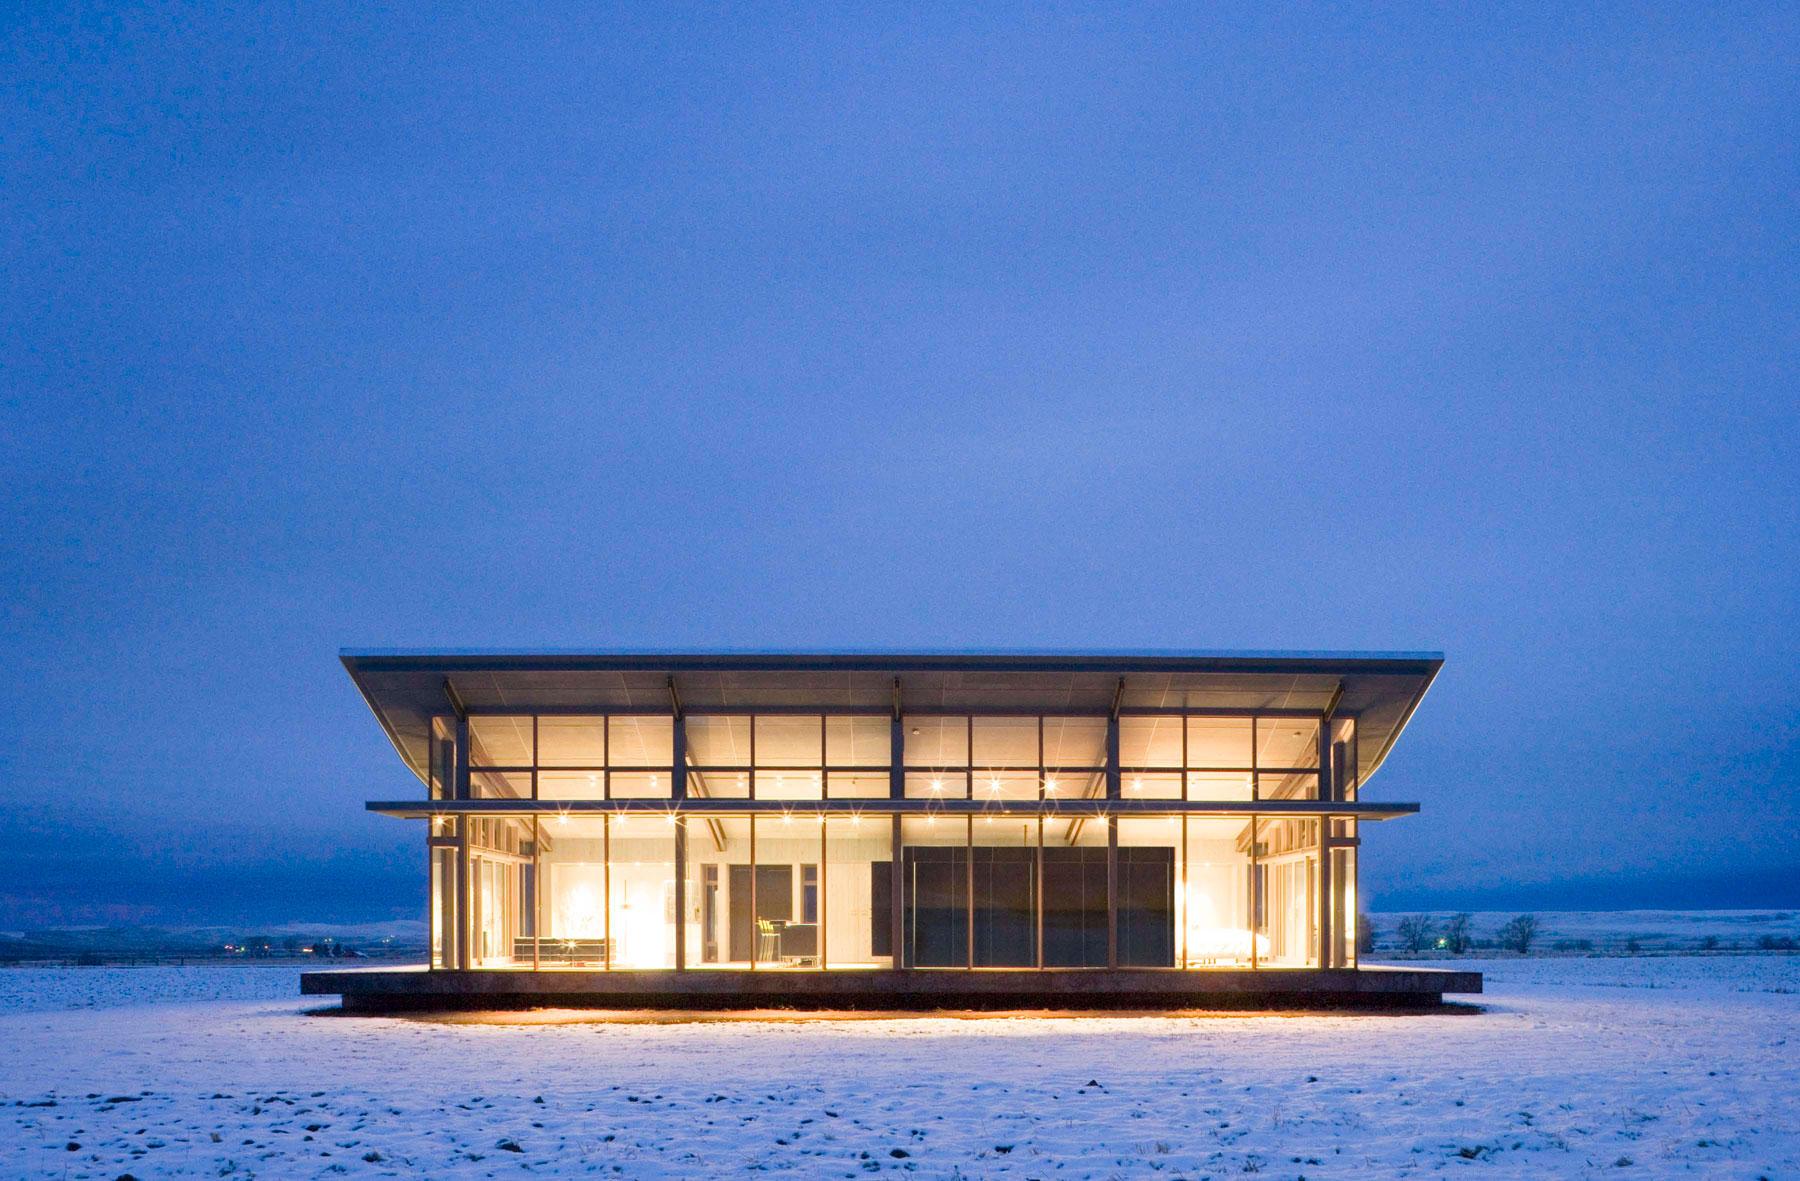 Dusk, Lighting, Snow, Glass Farmhouse in Northeast Oregon